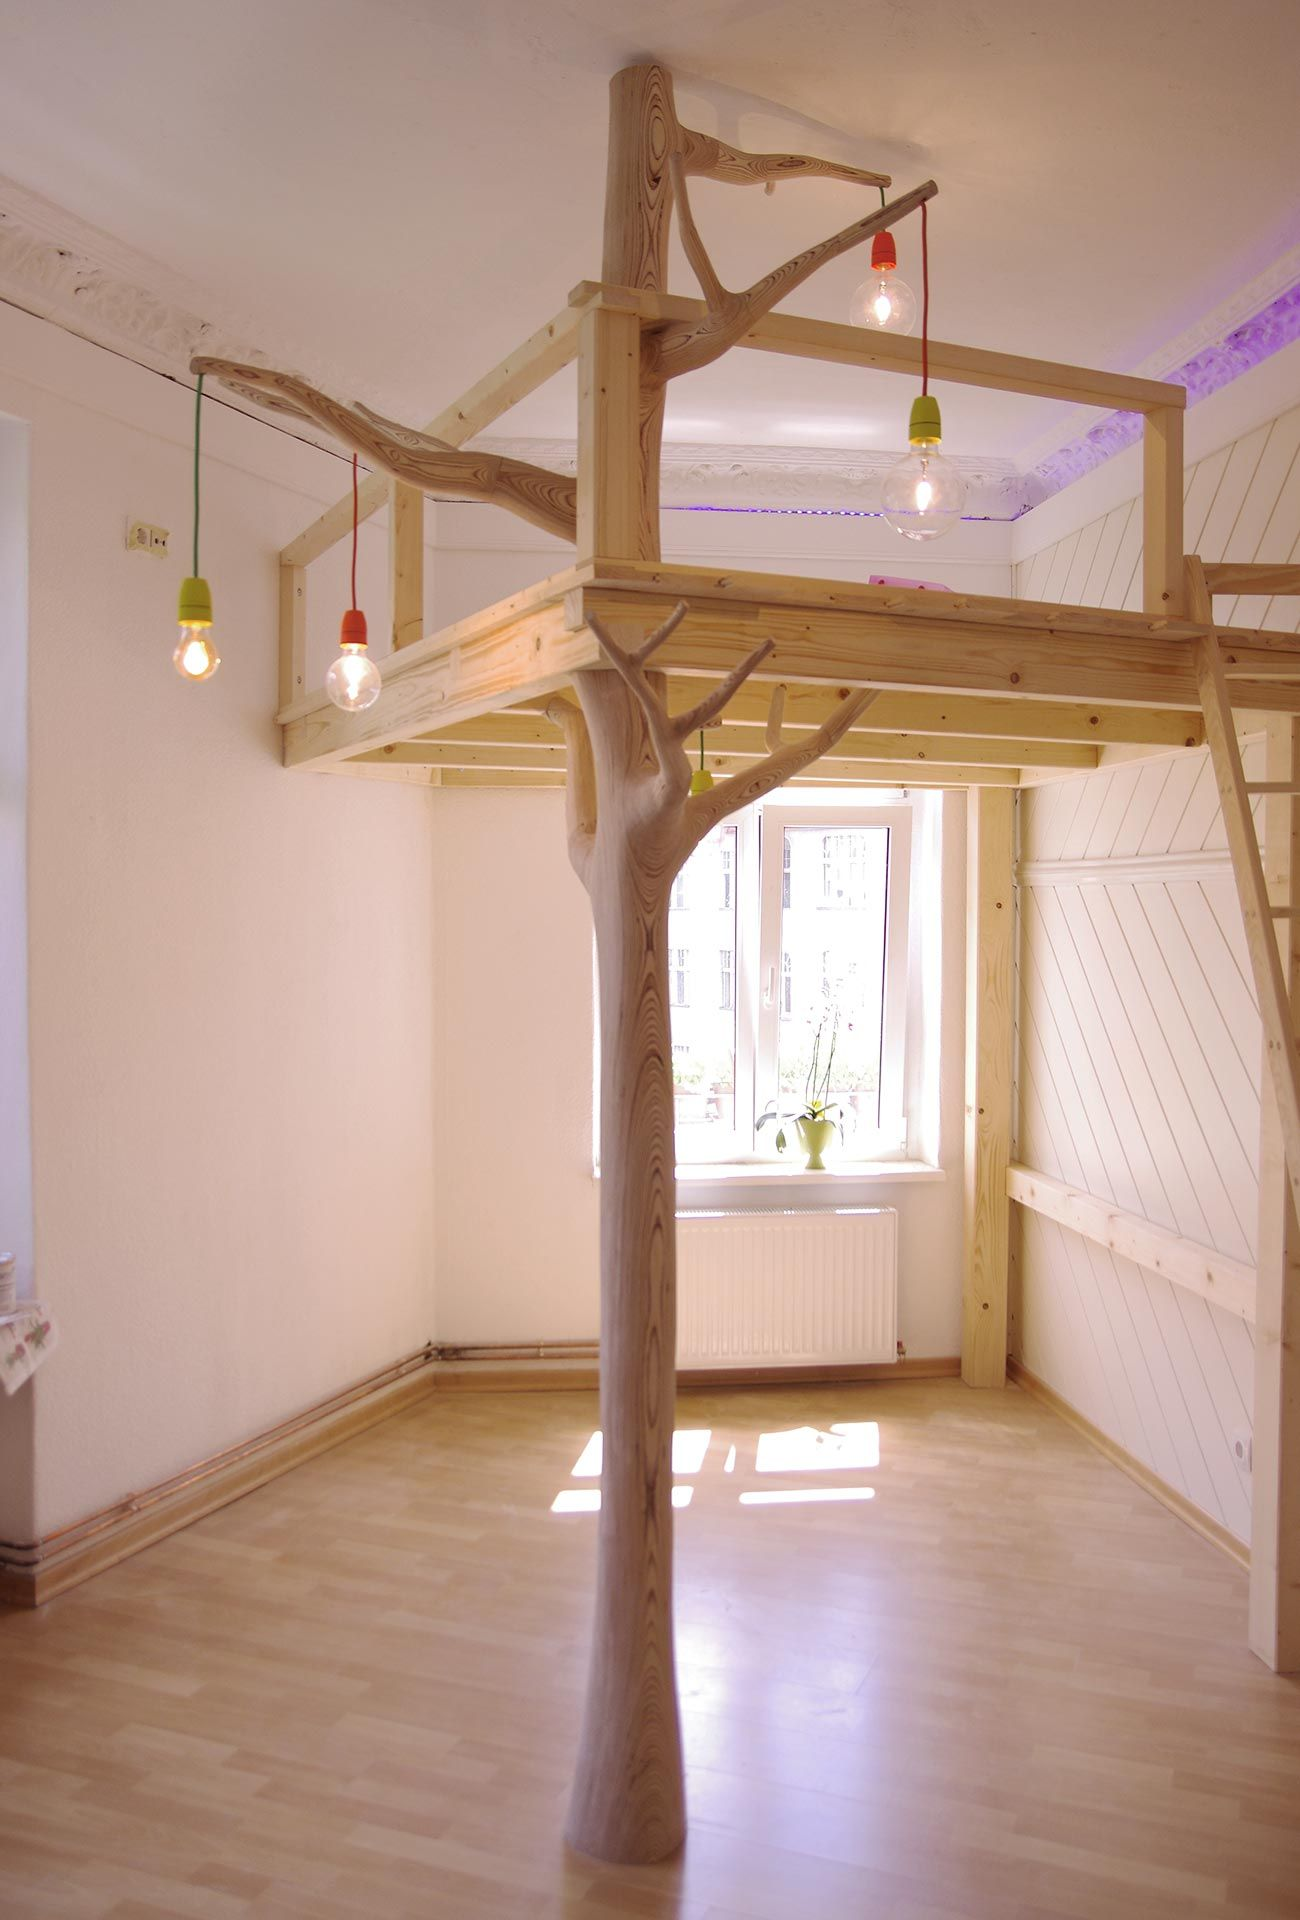 Zimmer string leuchtet ideen  mejores imágenes sobre coole raum ideen en pinterest  bricolaje